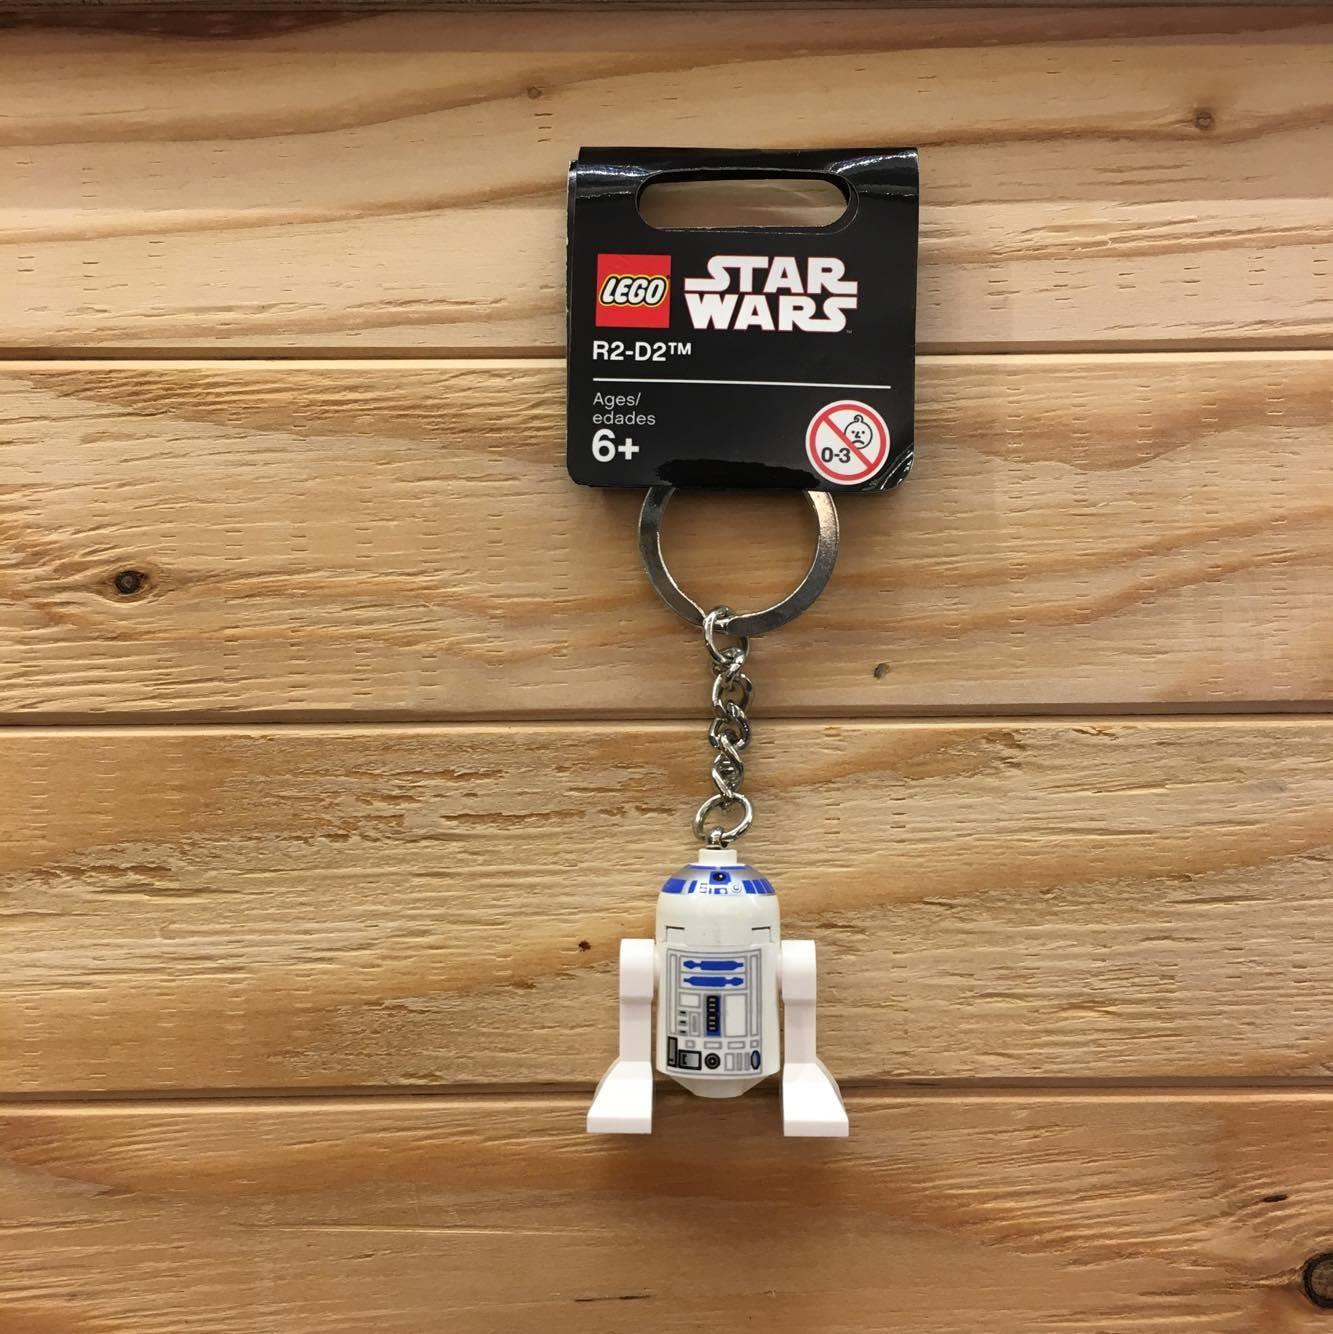 BEETLE LEGO STAR WARS R2-D2 星際大戰 樂高 積木 鑰匙圈 玩具 機器人 正品